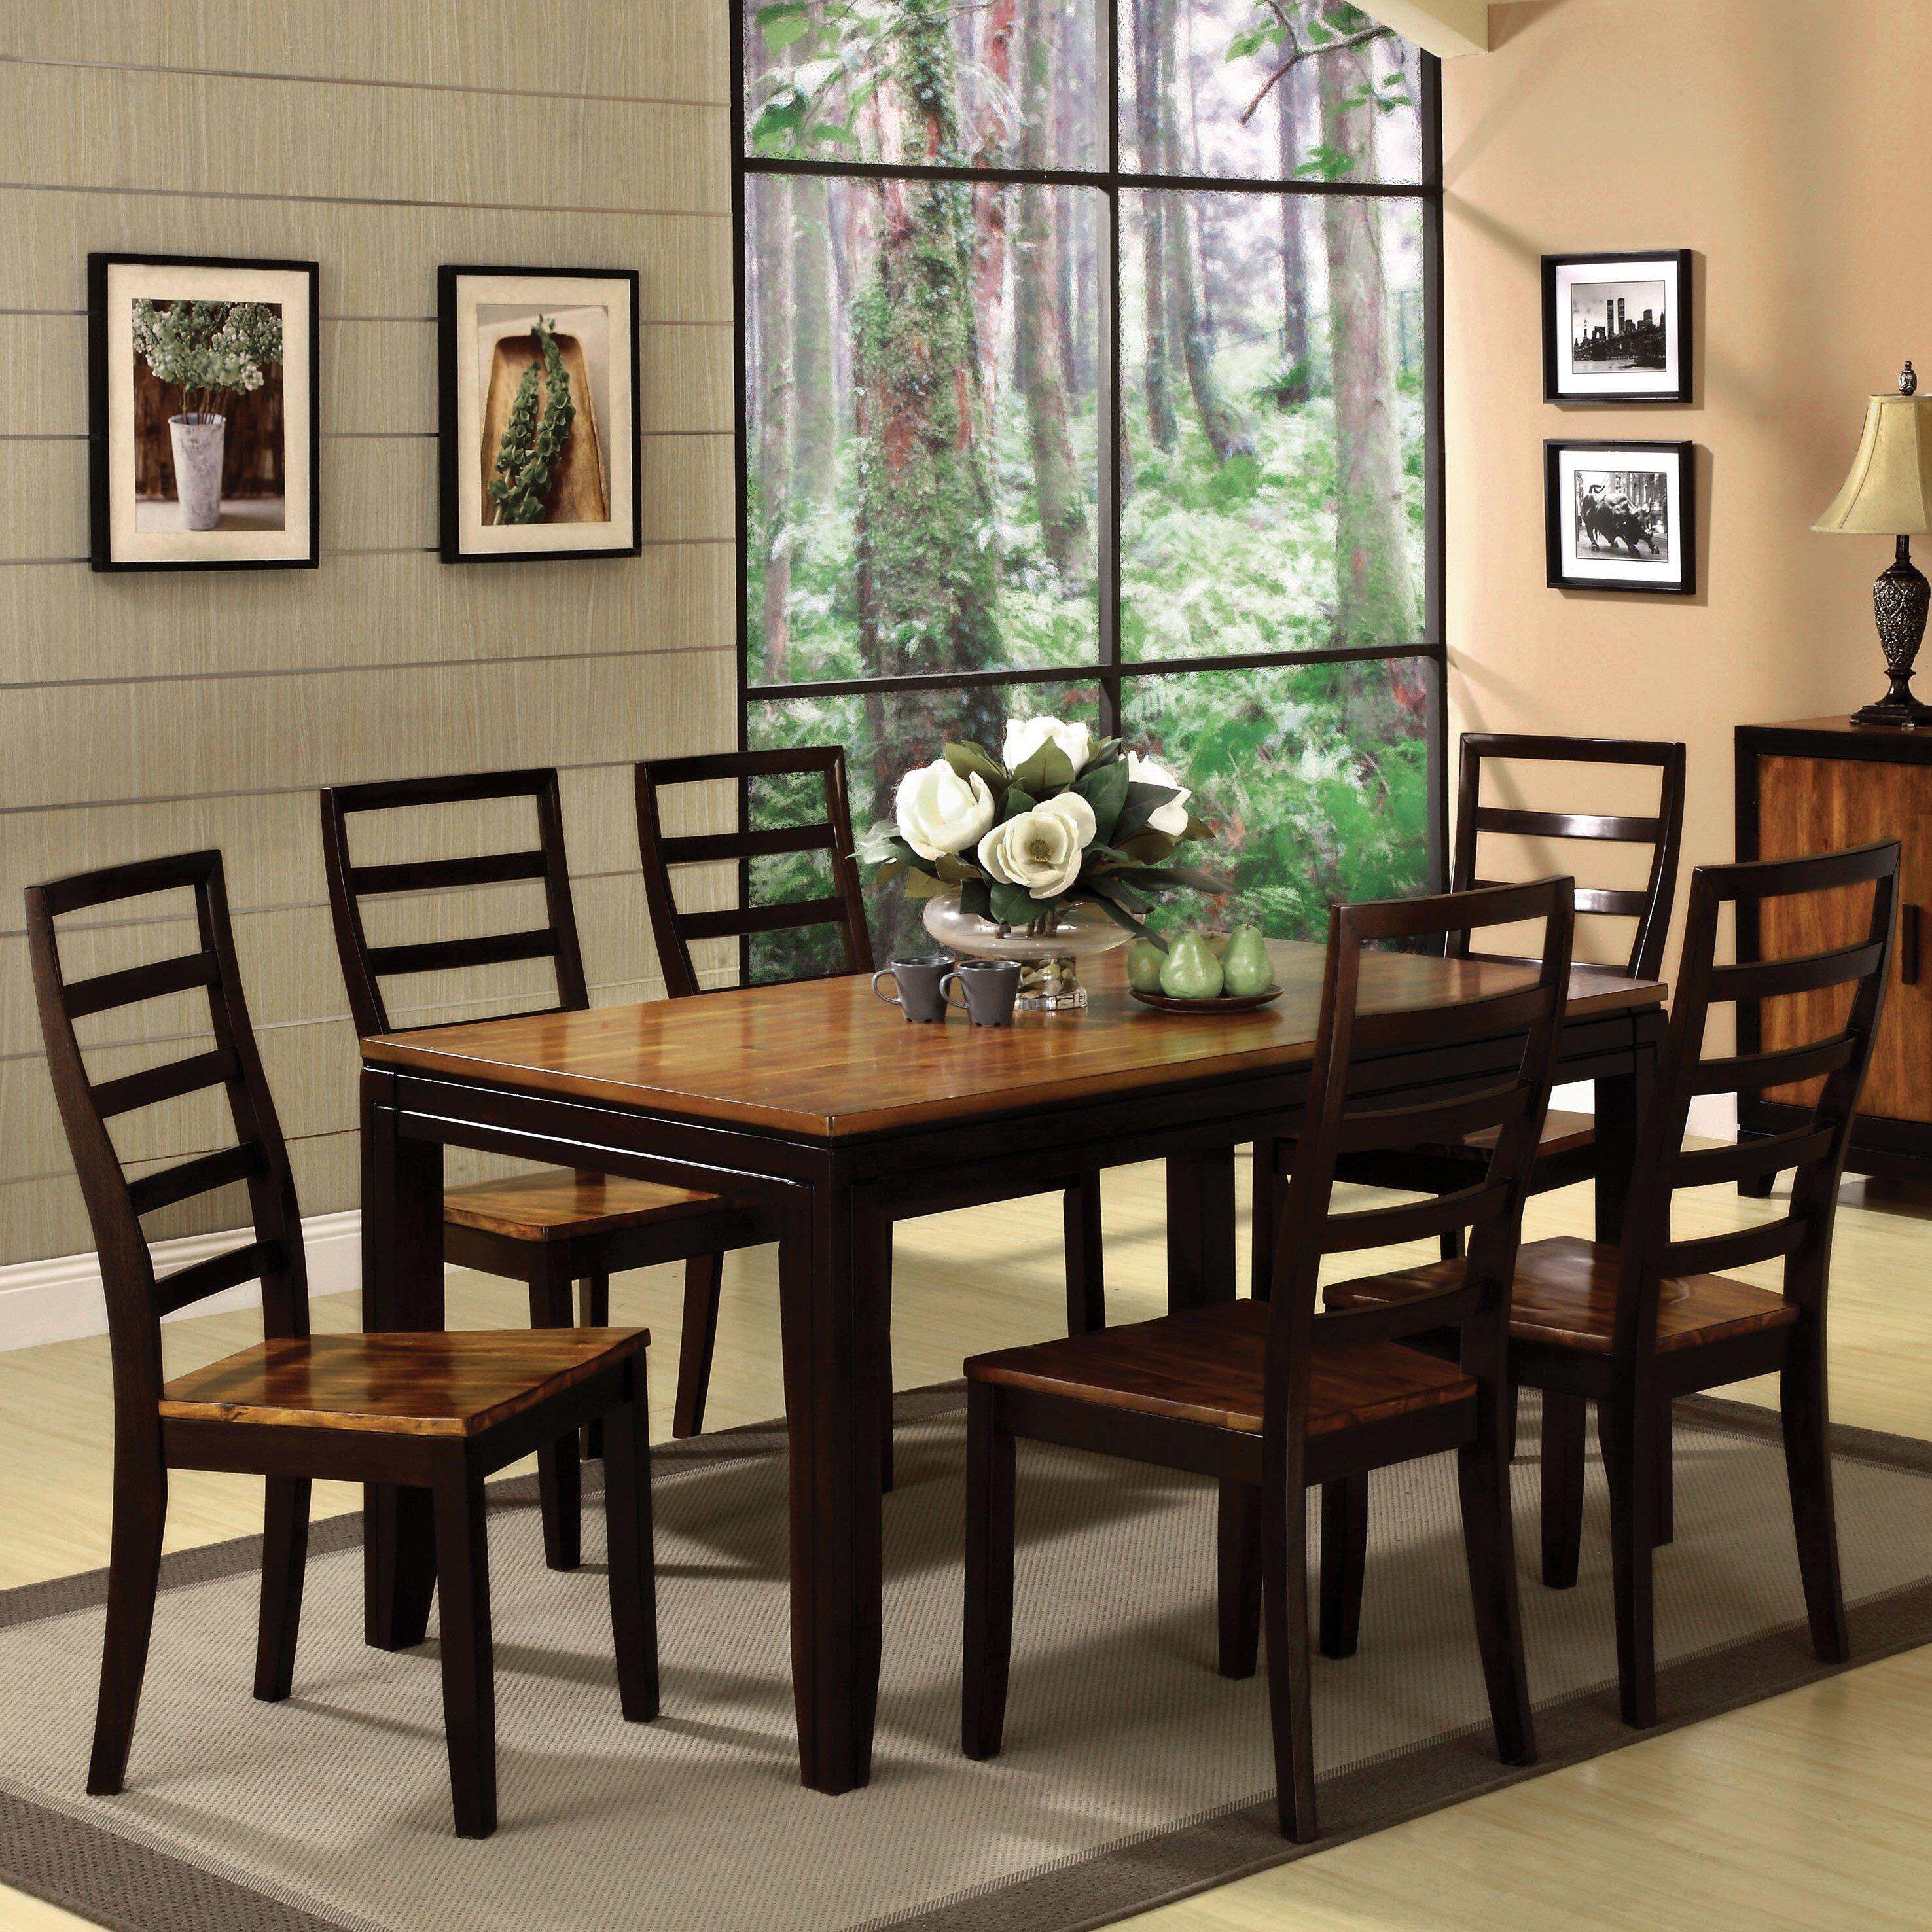 Hokku designs marion 9 piece dining set reviews wayfair for Hokku designs dining room furniture